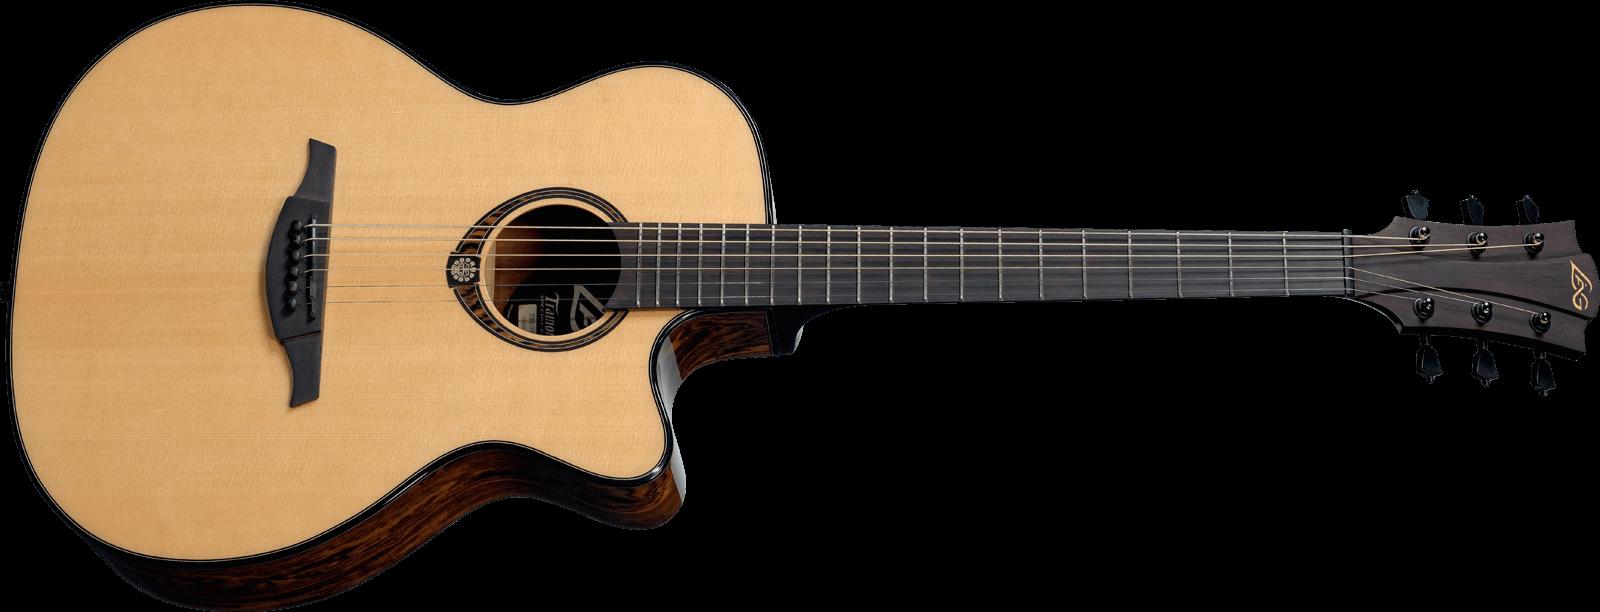 Expert Review Lag Guitars Tramontane Snakewood Series 701edce Dreadnought Guitar Acoustic Guitar Guitar Body